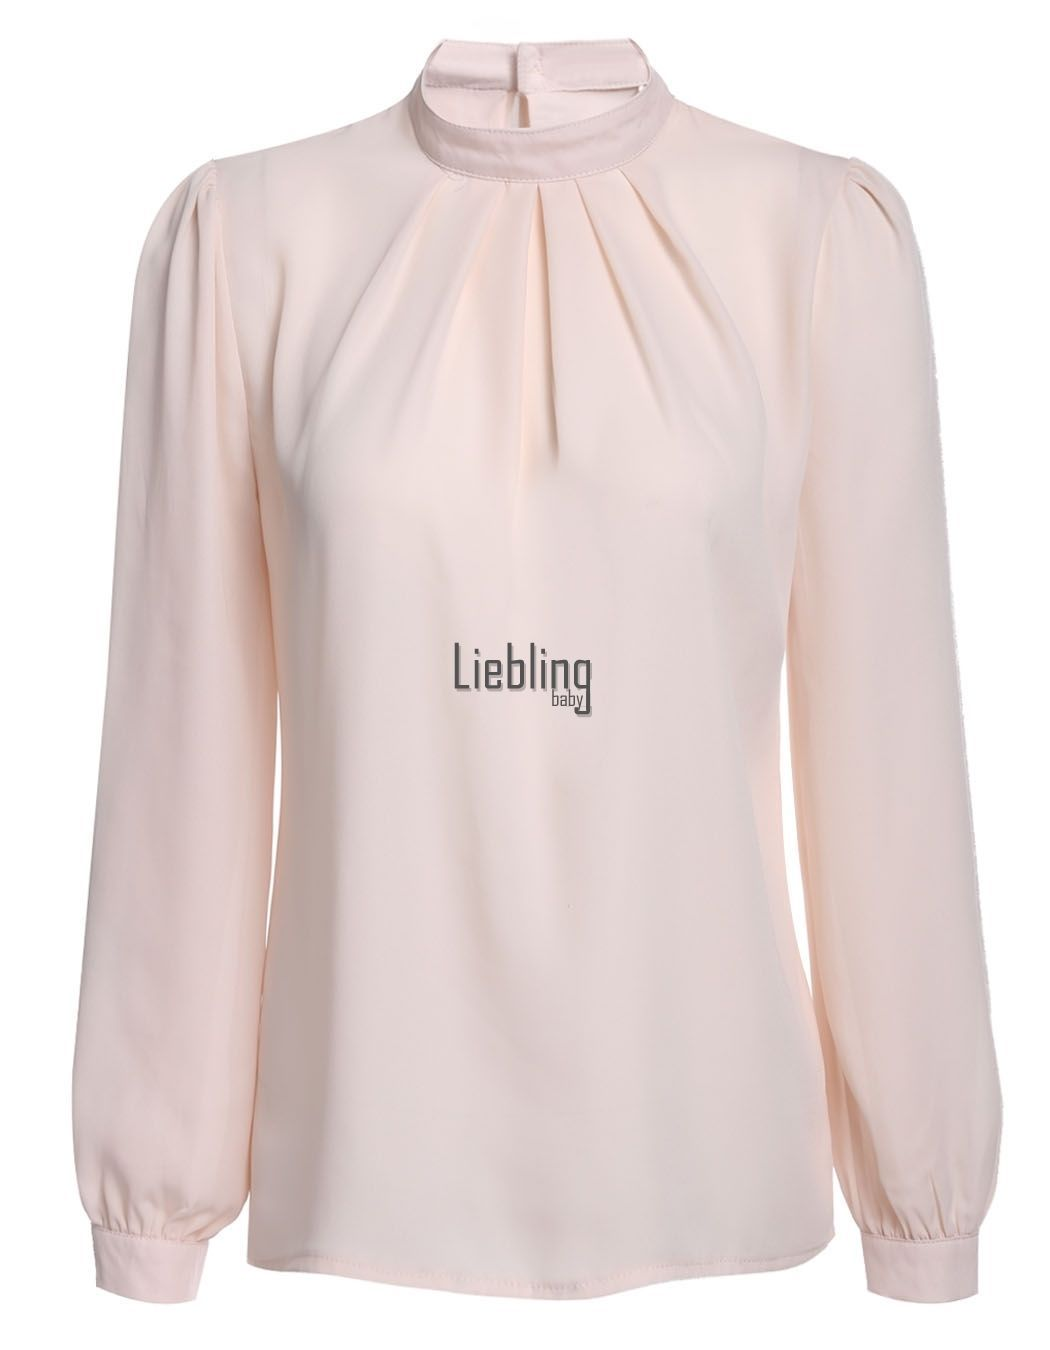 Informal Mujer Blusa Chifón Manga Larga camiseta de Holgado Corto Suéter  LEBB 6 • EUR 2 ceb3b264fb6dc